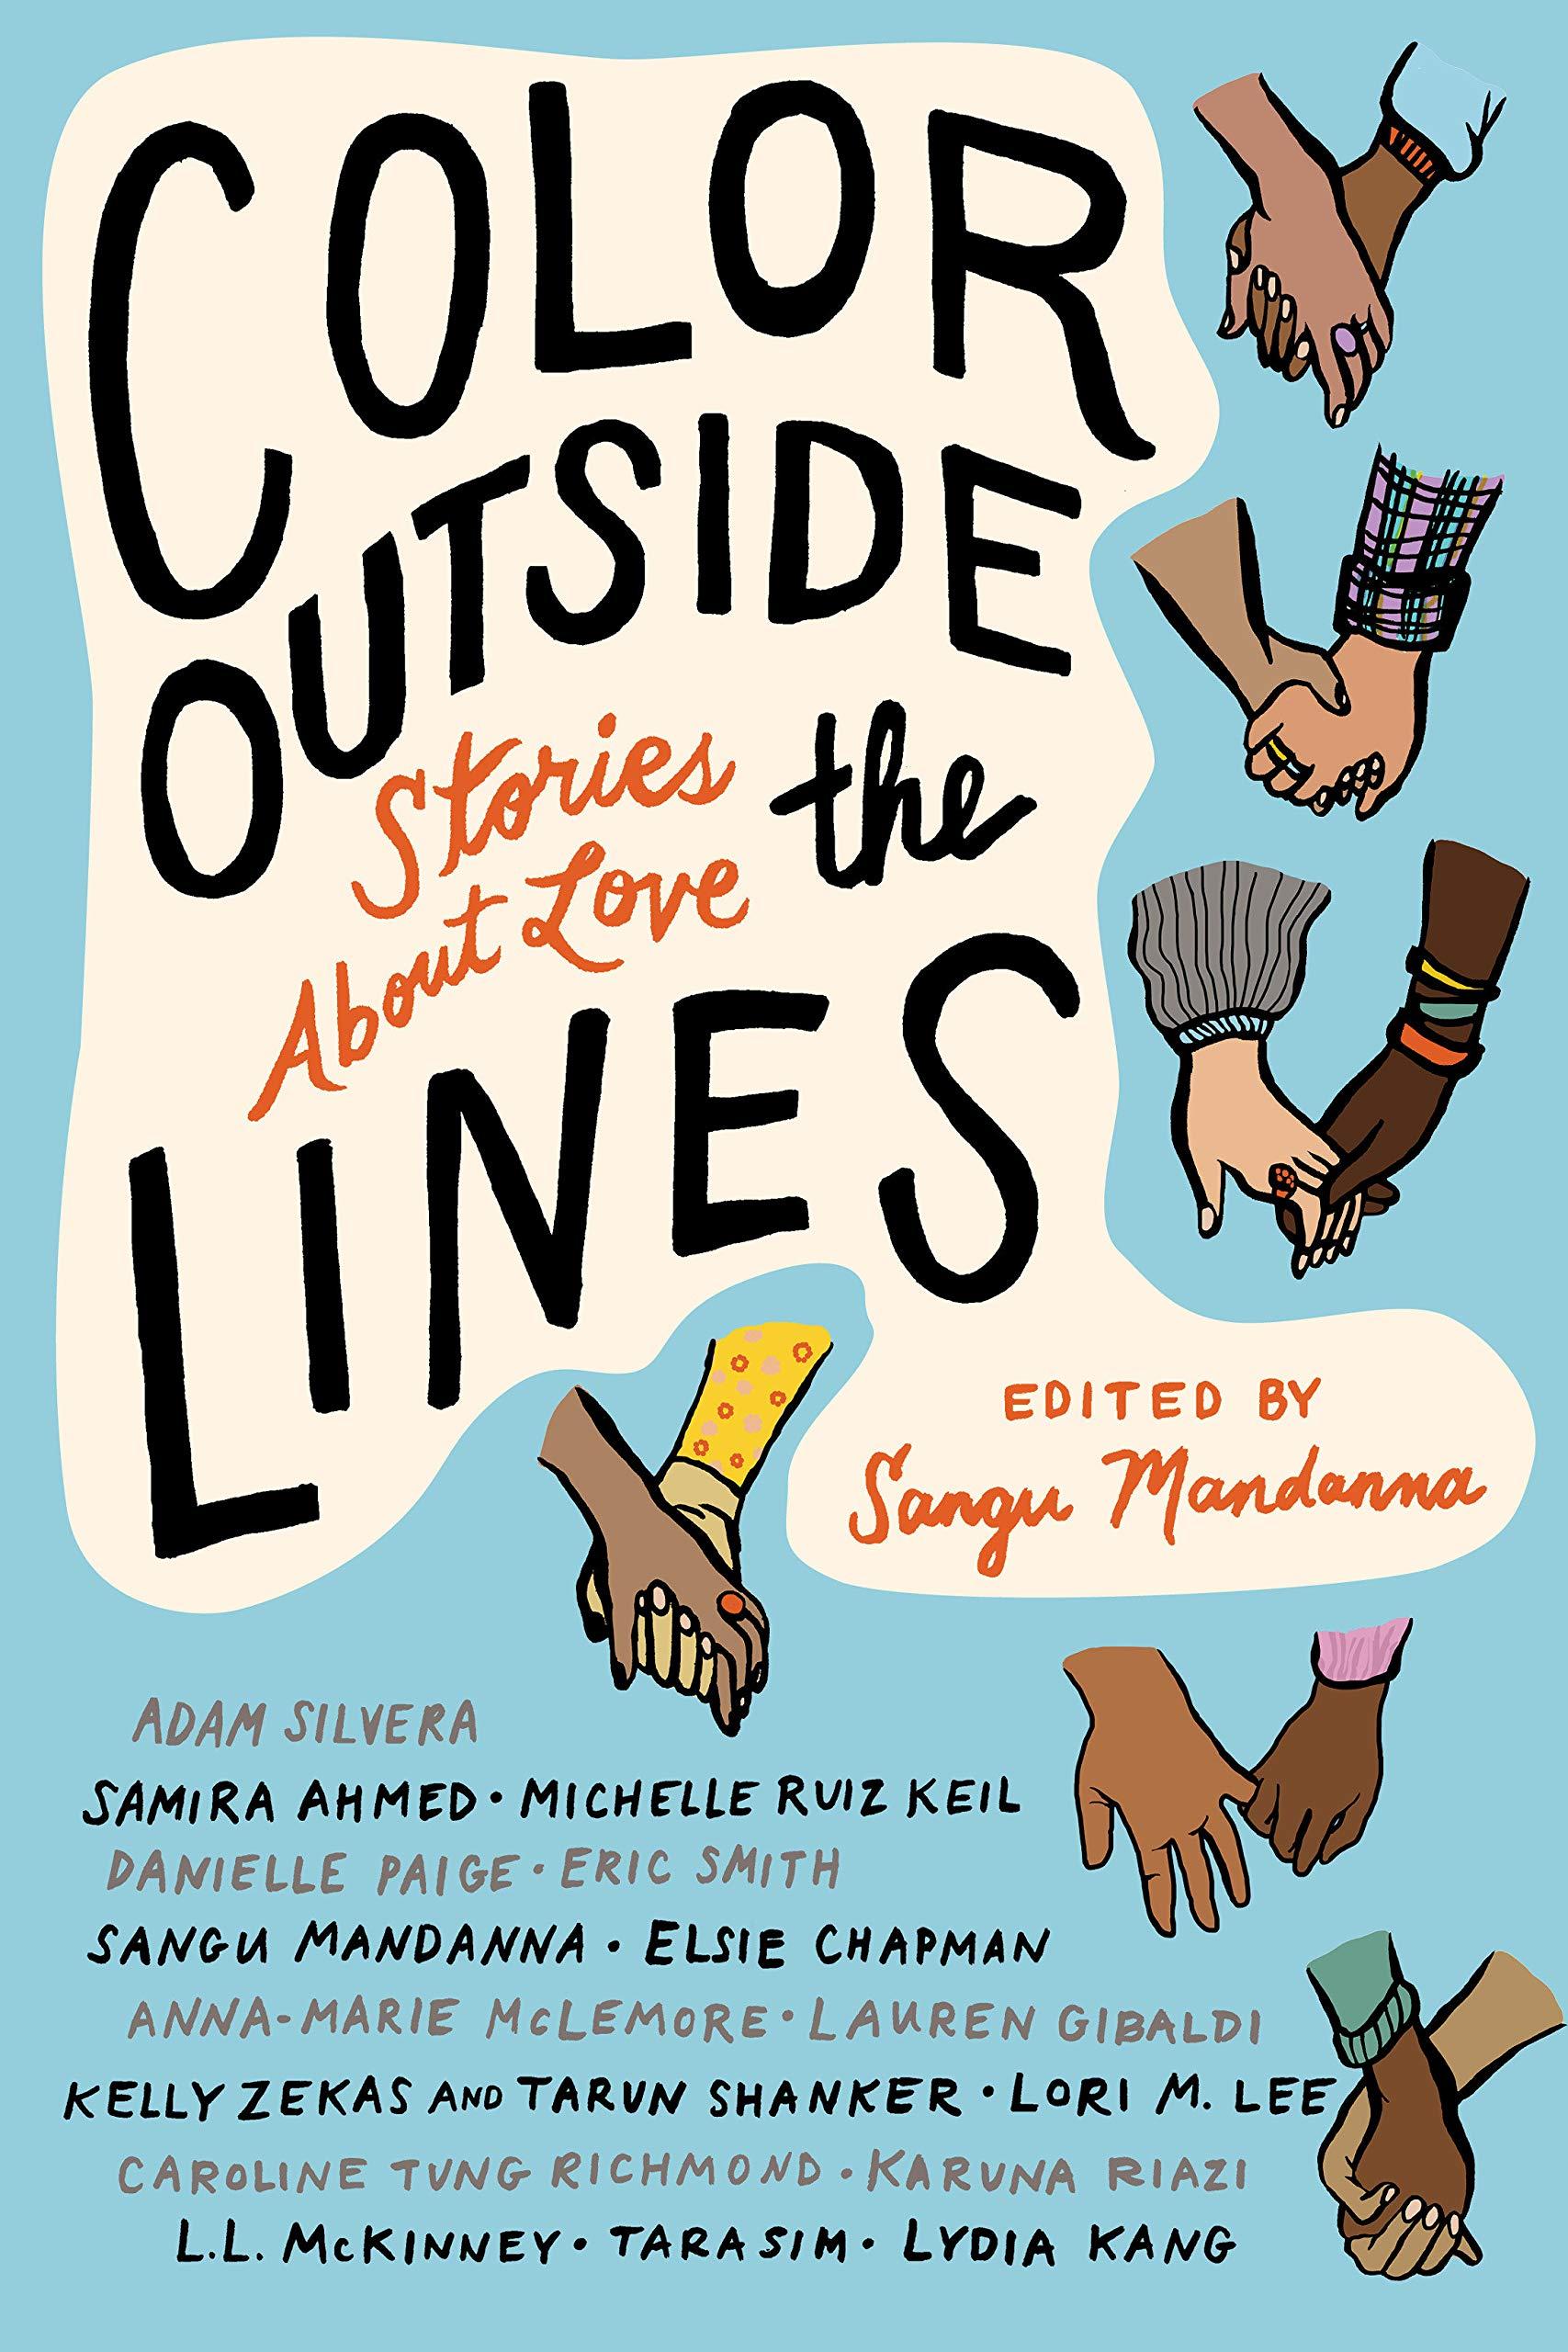 Amazon.com: Color outside the Lines: Stories about Love (9781641290463):  Mandanna, Sangu, Ahmed, Samira, Silvera, Adam, Smith, Eric, McLemore,  Anna-Marie: Books